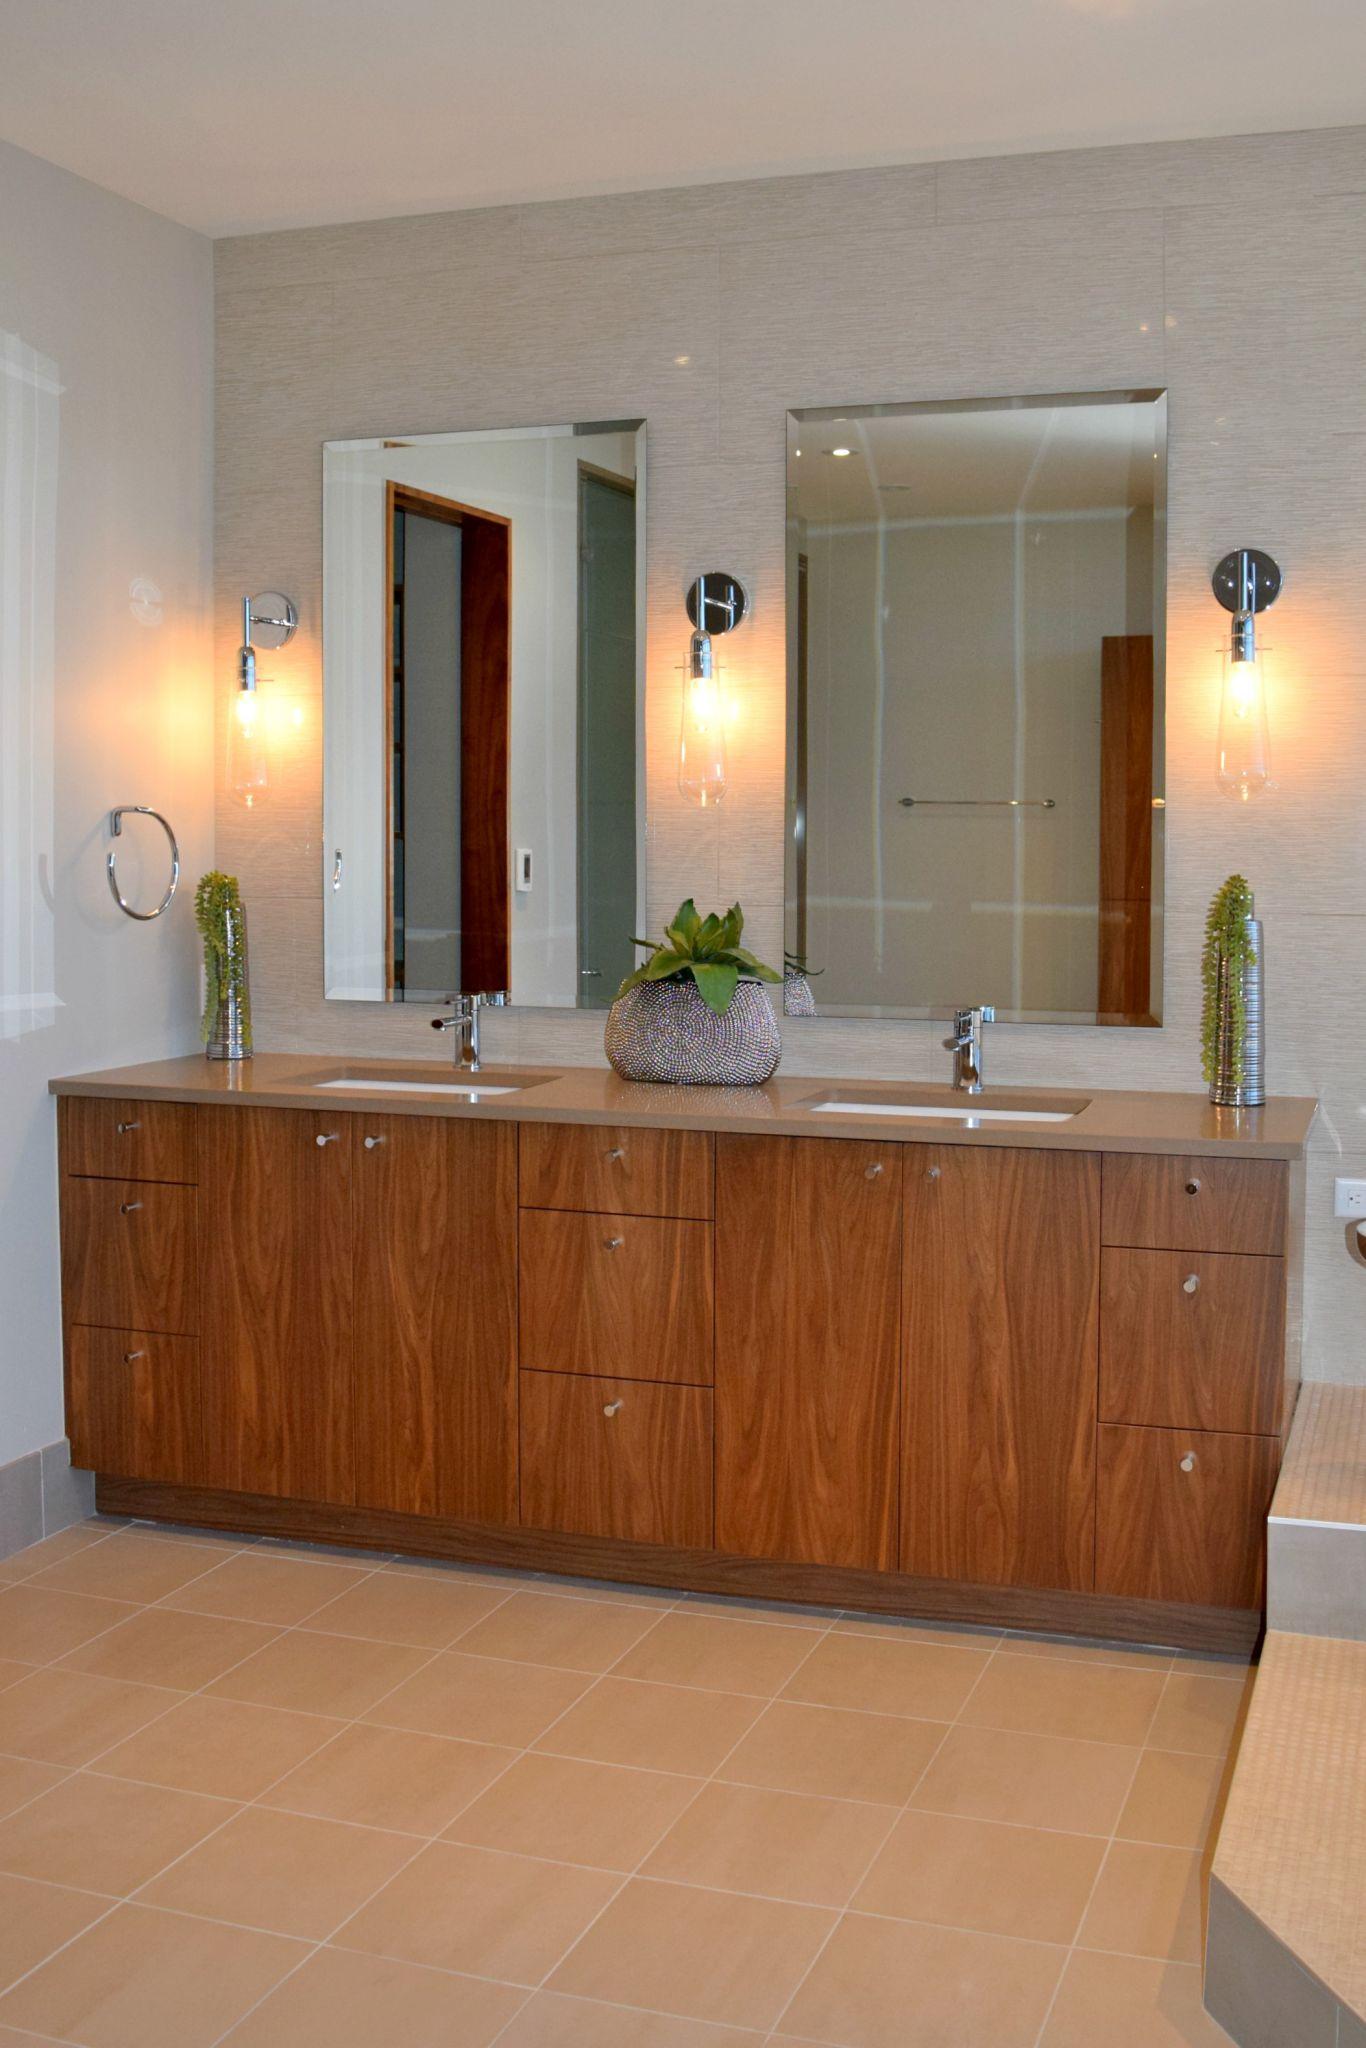 semi custom bathroom cabinets. Feb Crystal Cabinet Works With Semi Custom Knotty Alder Bathroom Cabinets C